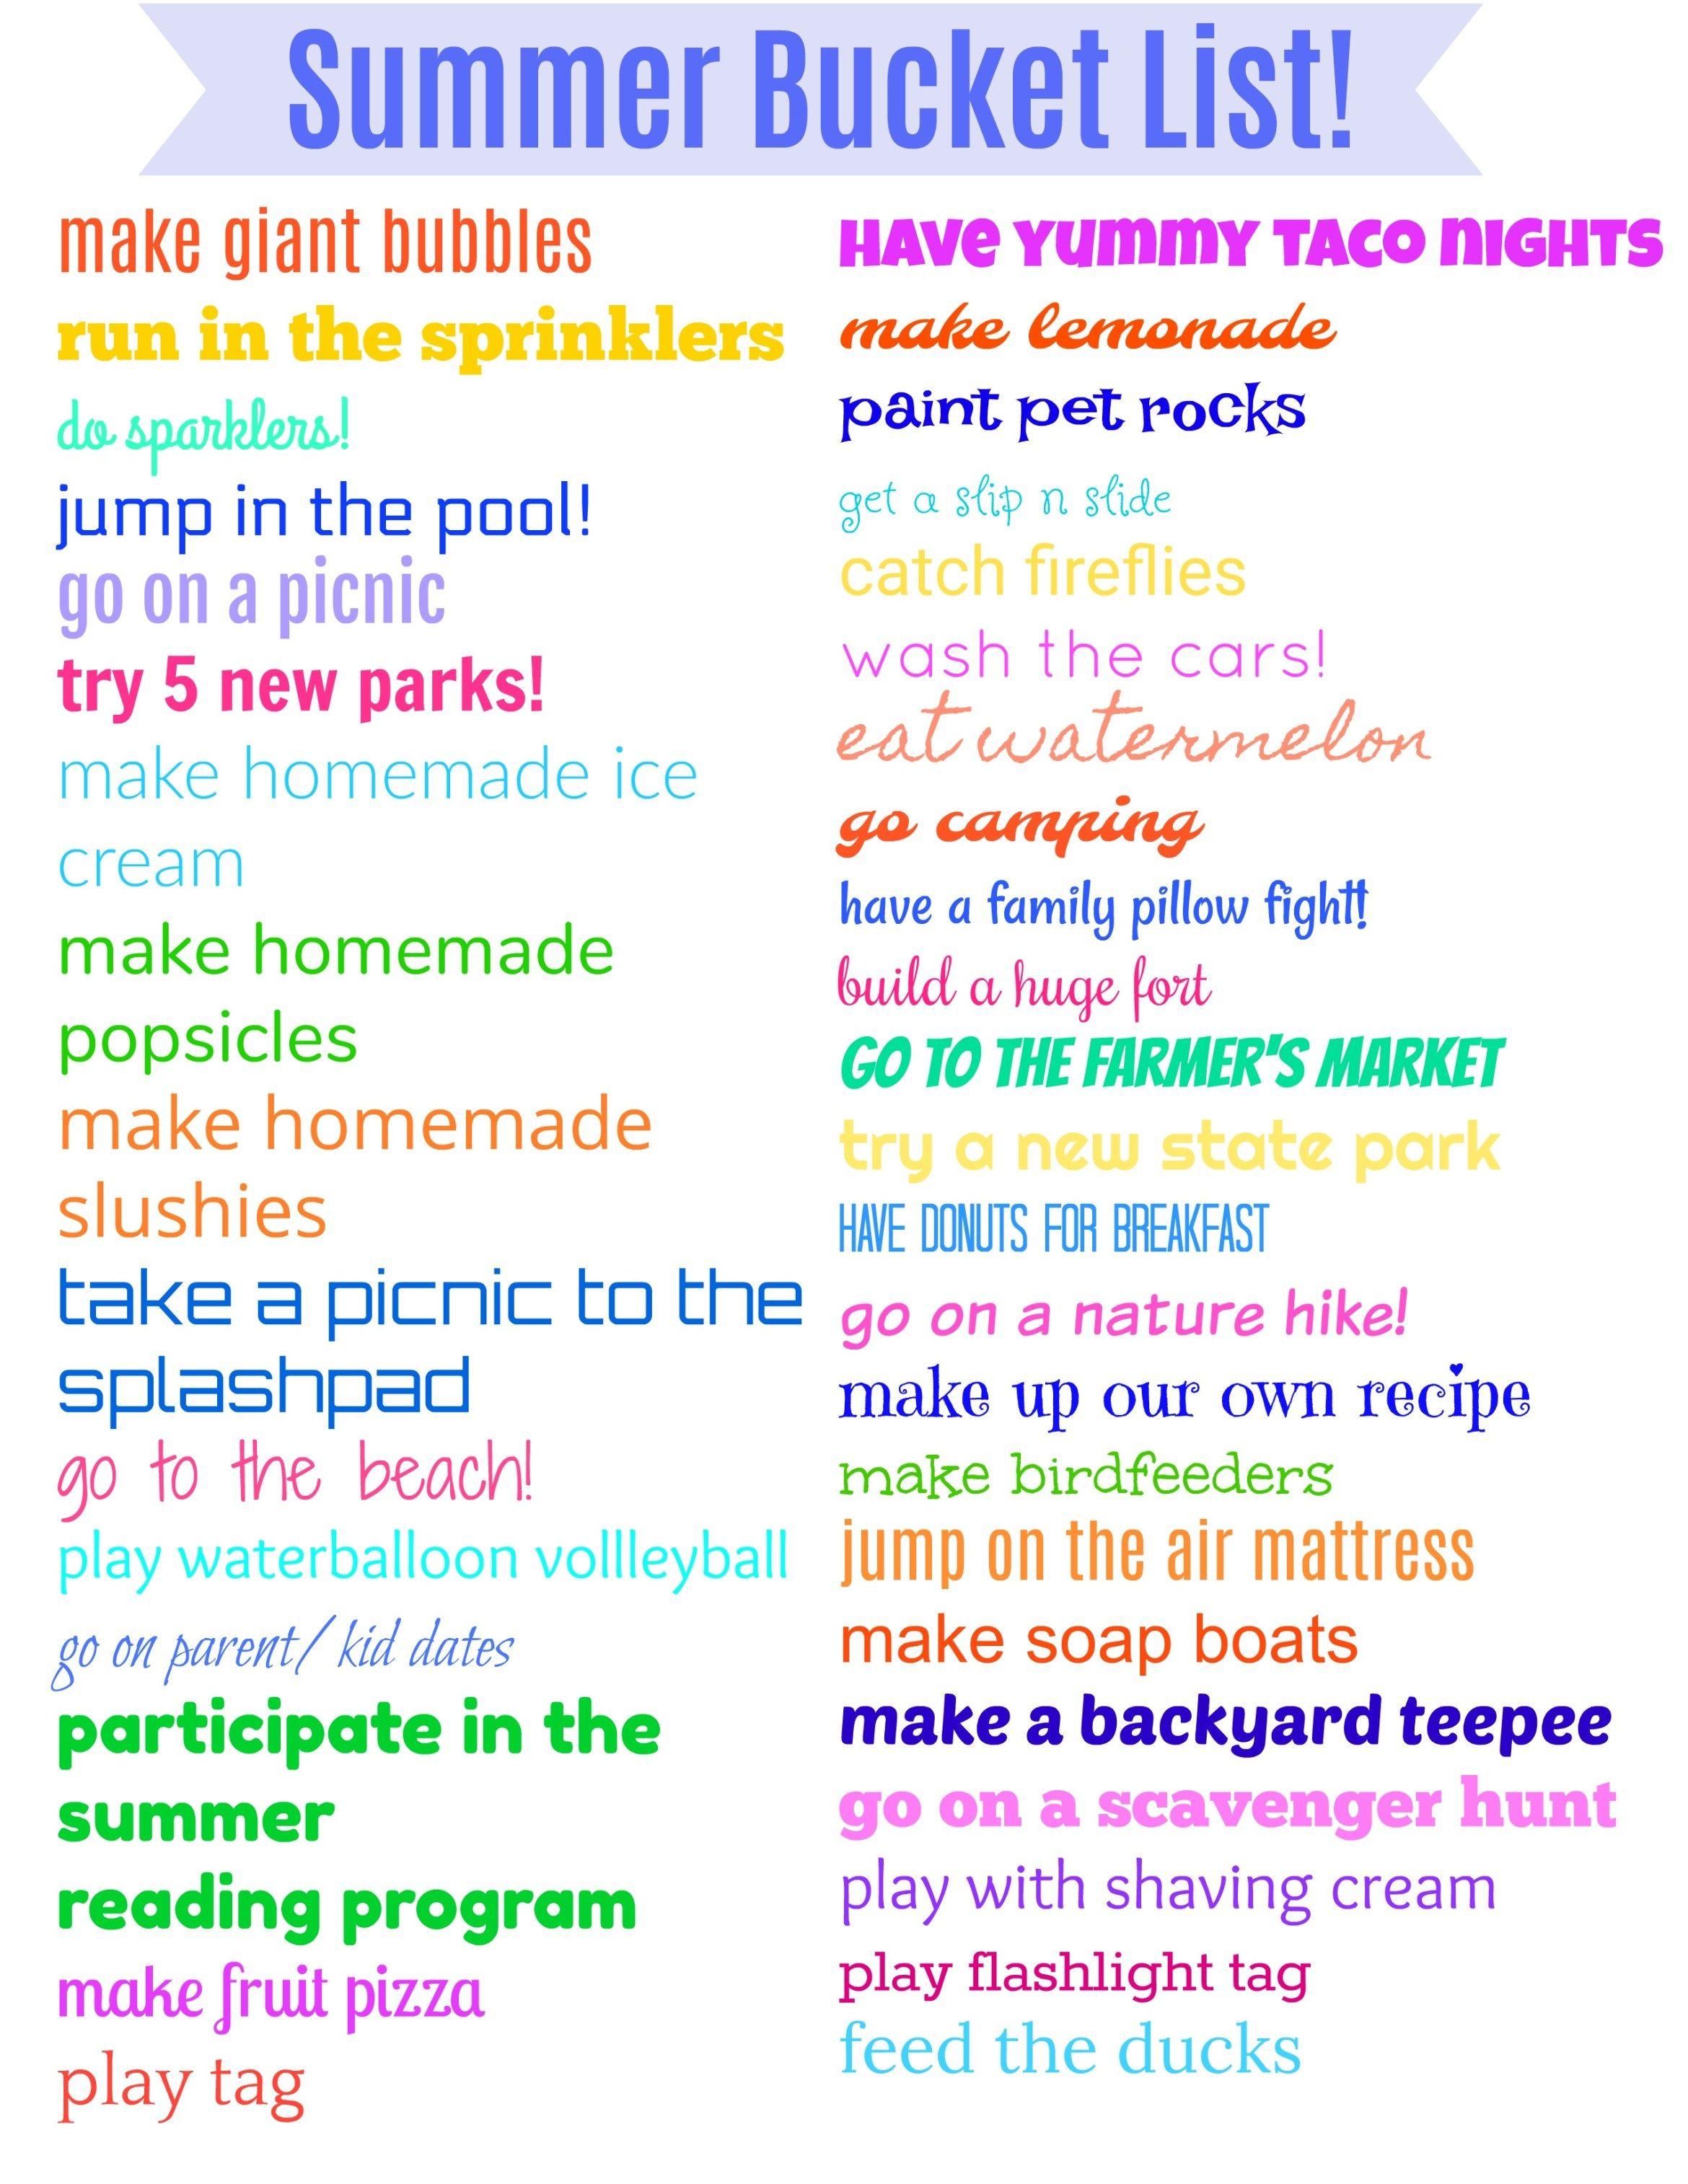 Summer Bucket List For Preschoolers Amp Toddlers